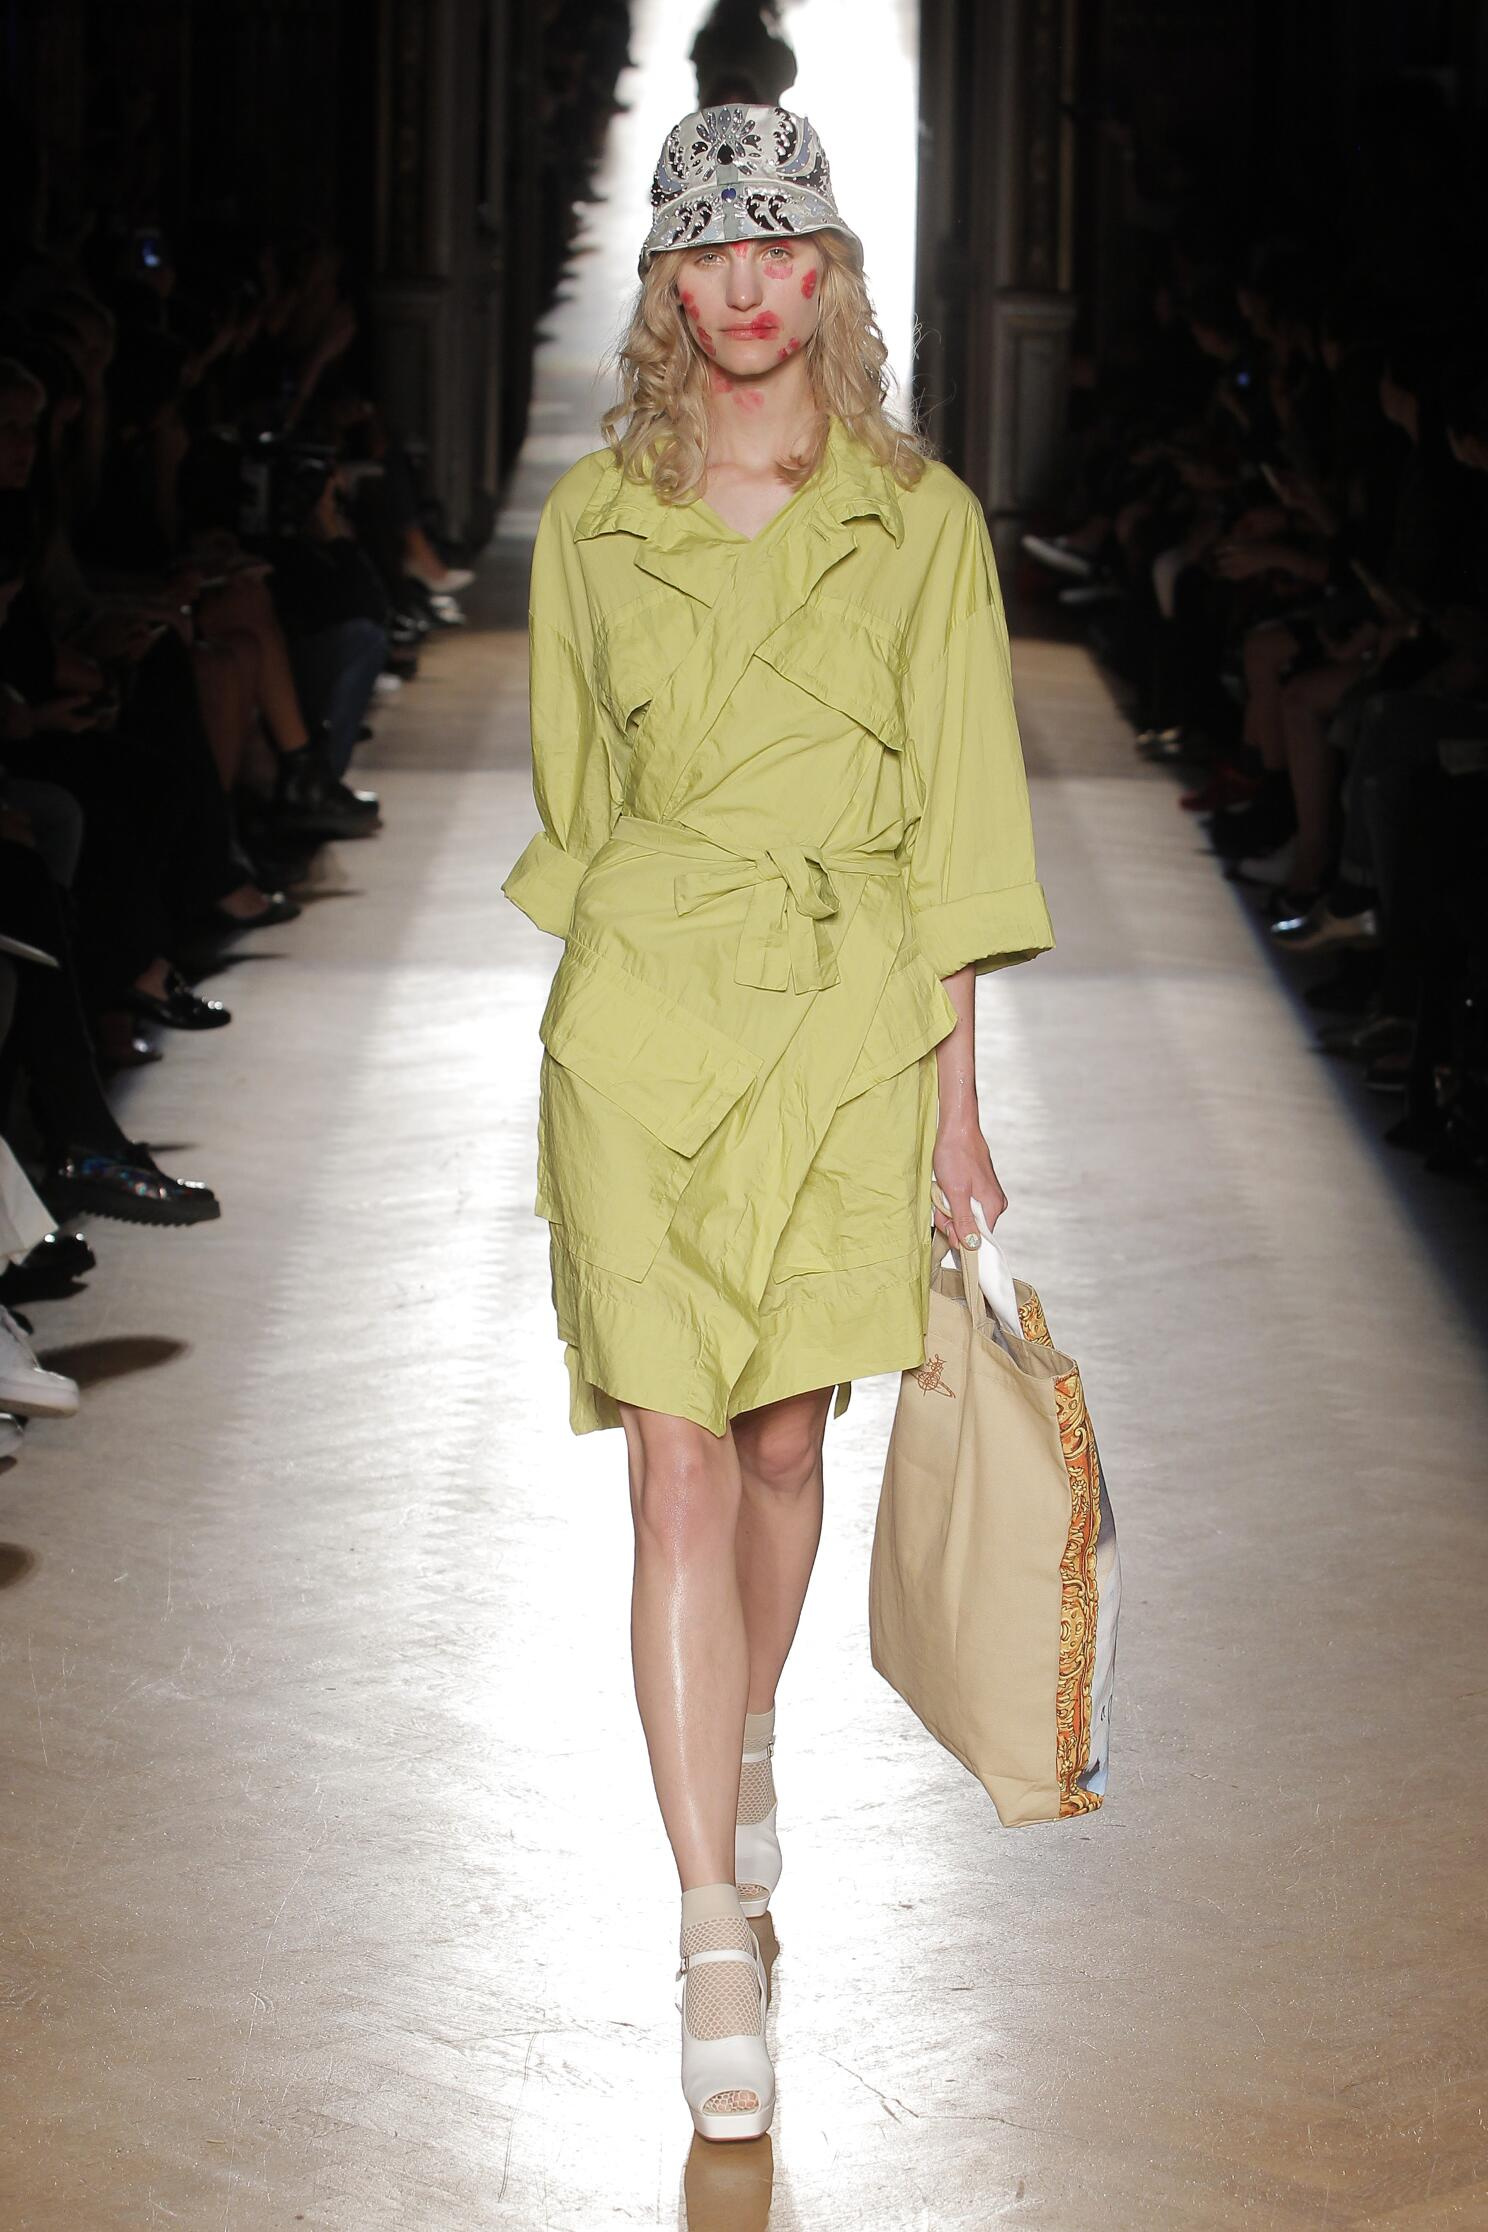 Fashion Woman Model Vivienne Westwood Gold Label Catwalk